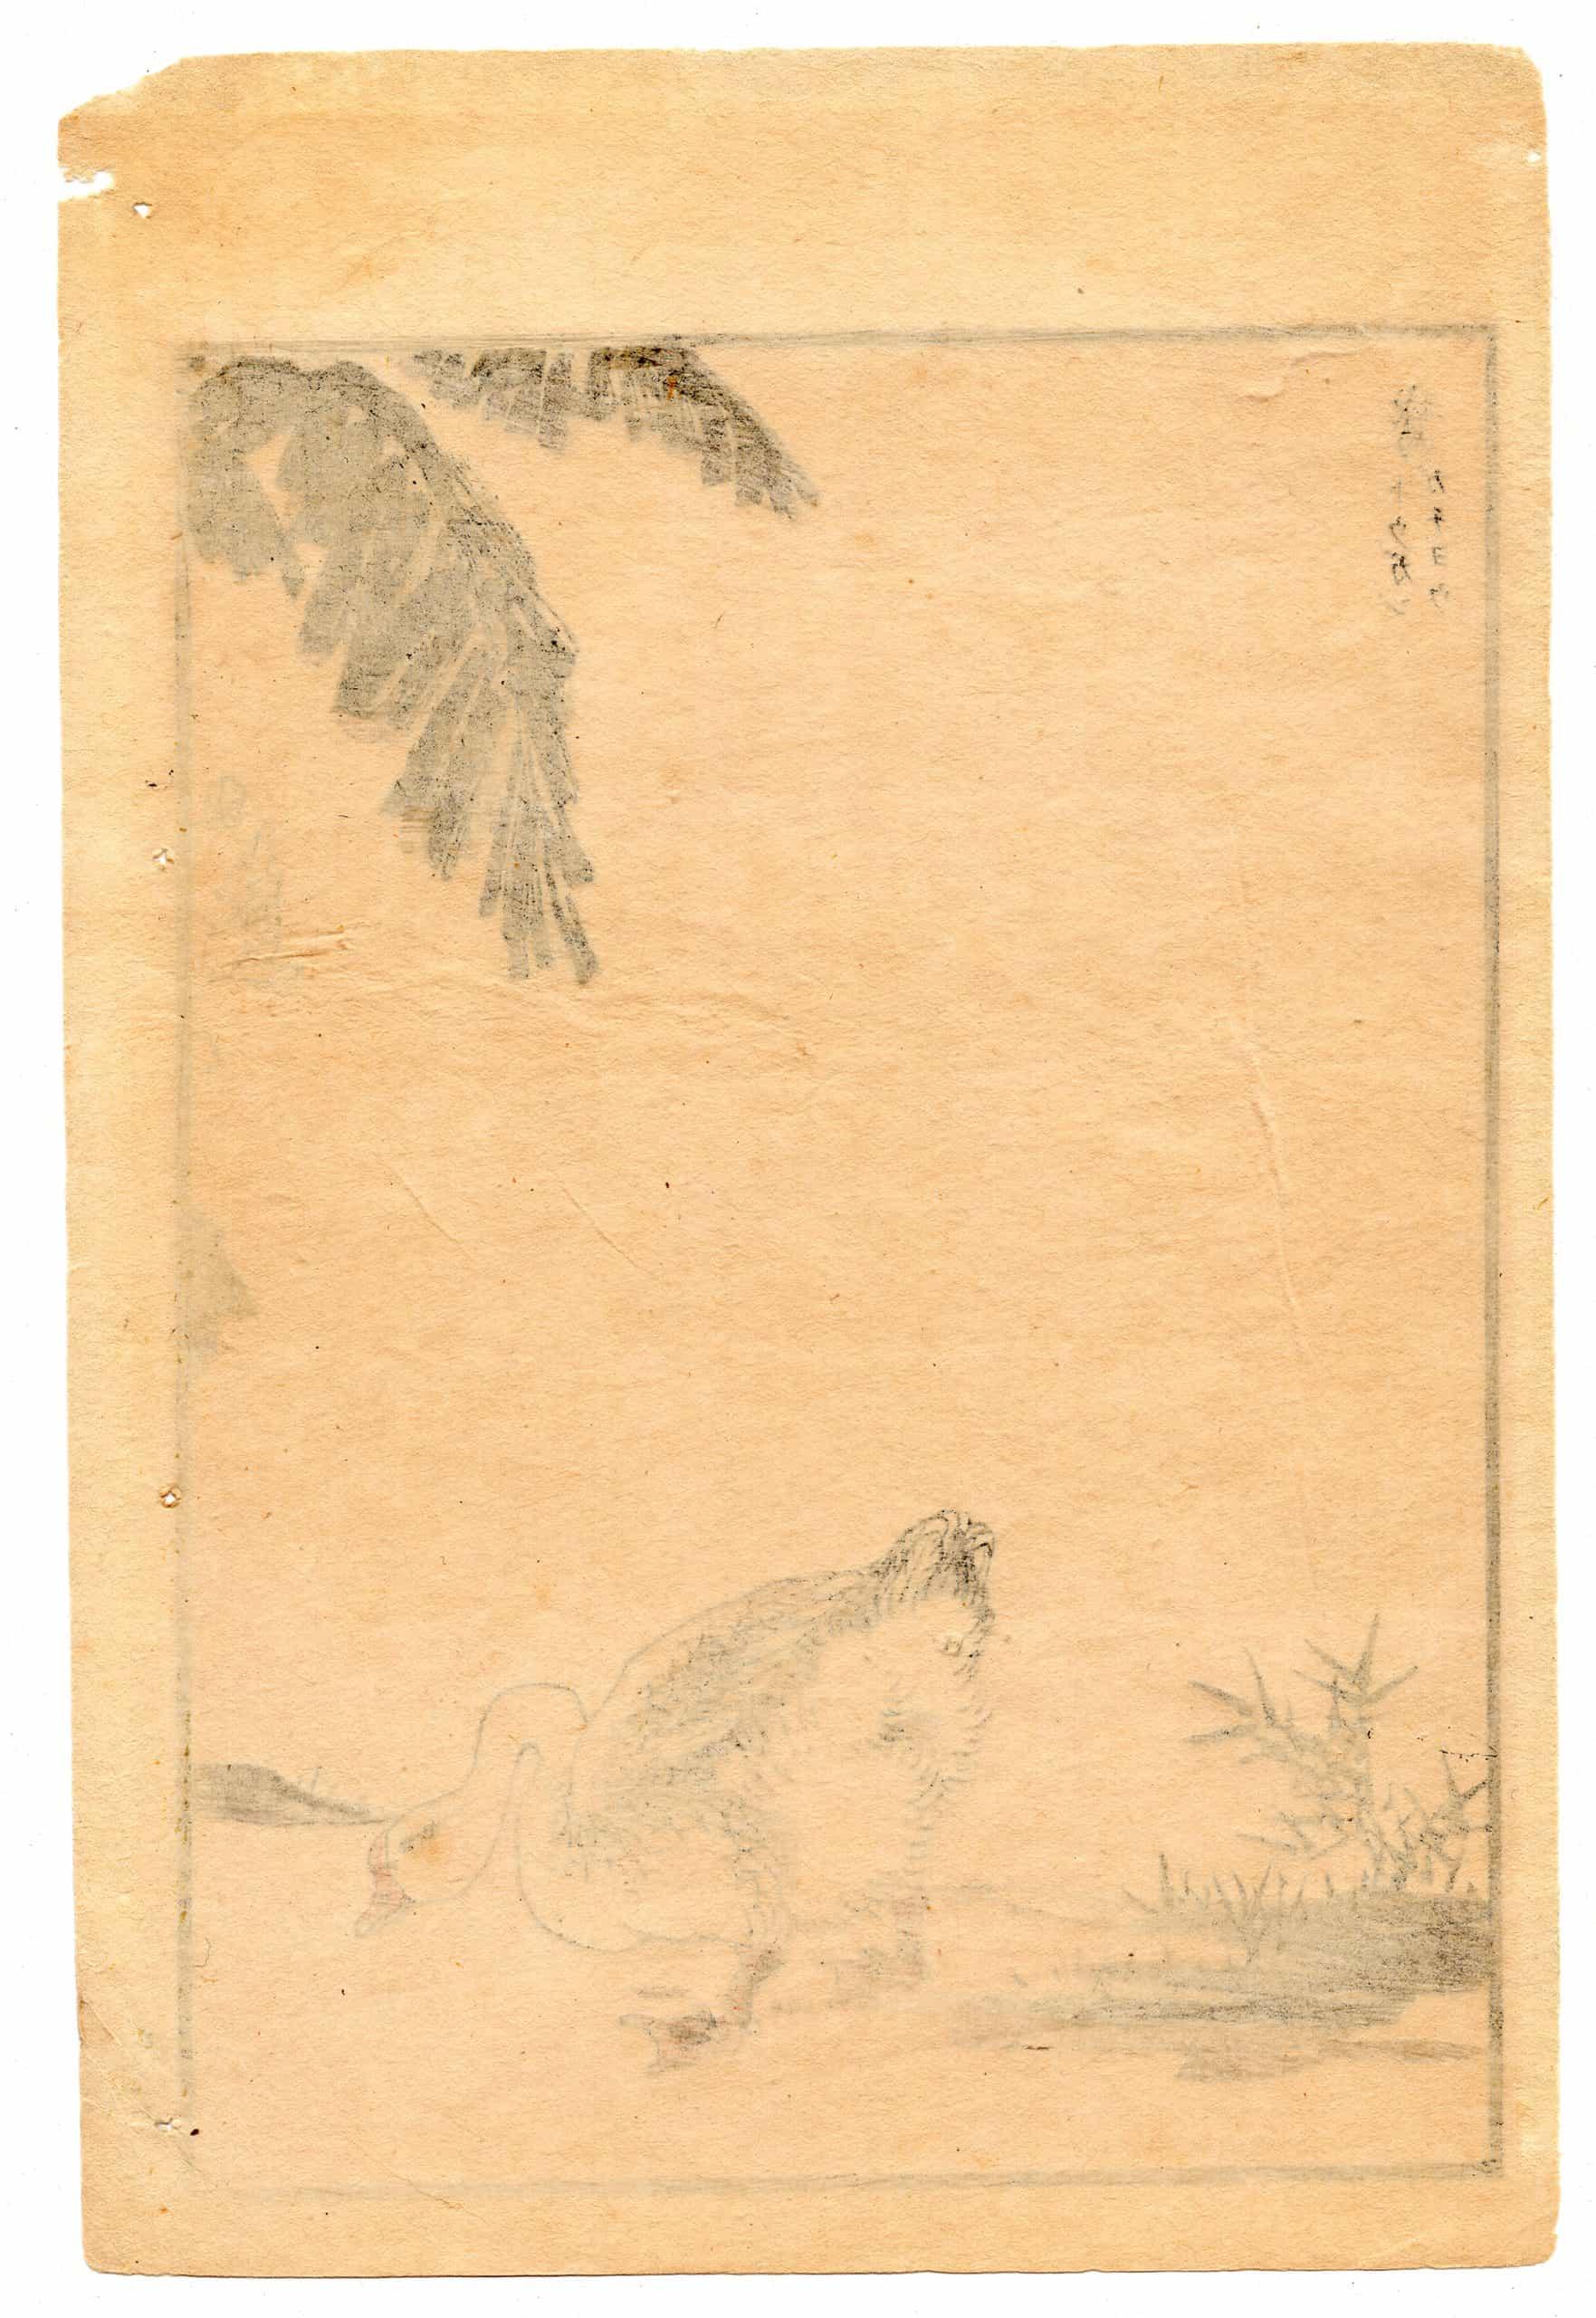 Bairei Kono - A Goose from One Hundred Birds (verso)